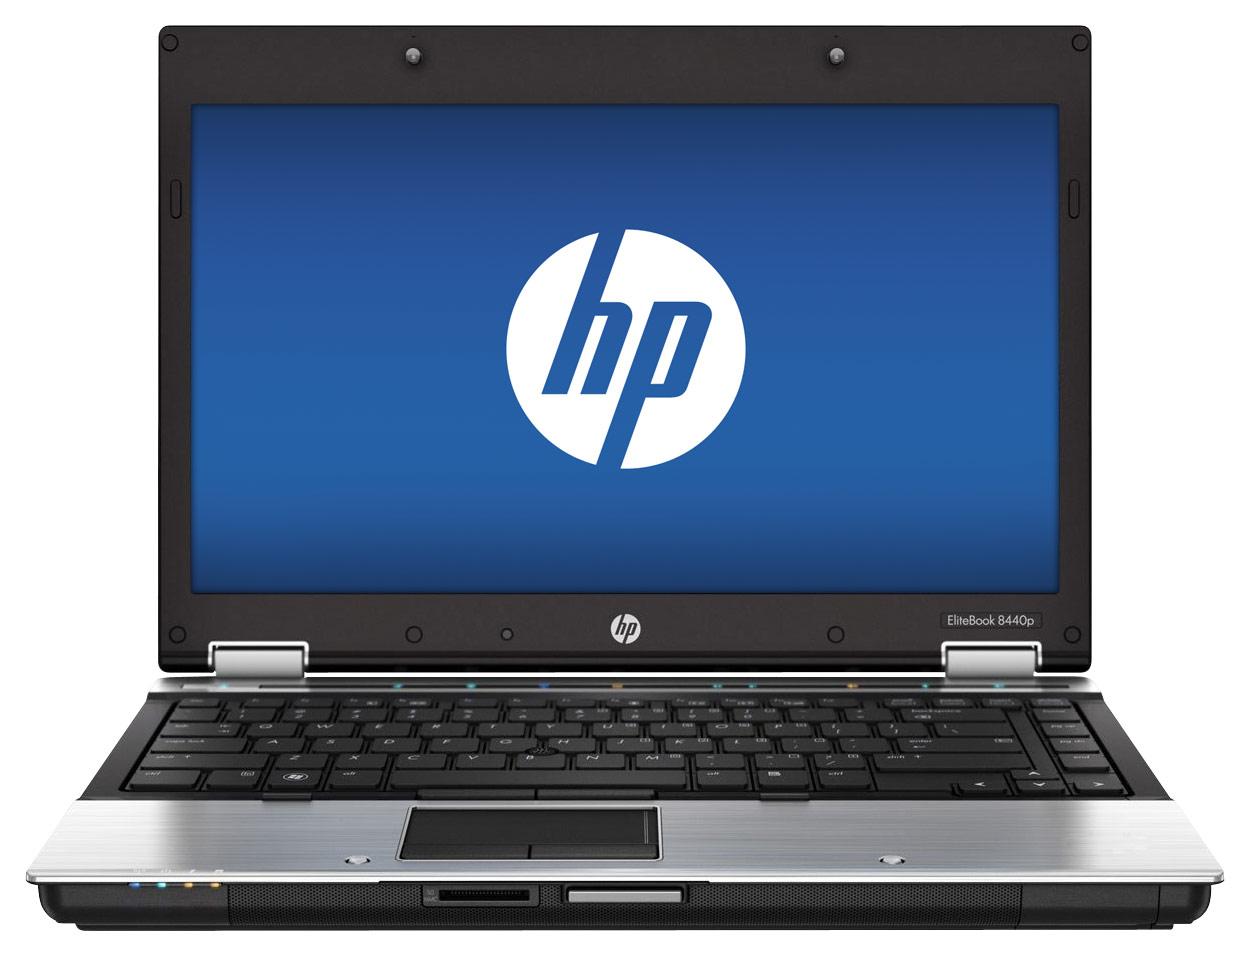 HP - EliteBook 14.1 Refurbished Laptop - Intel Core i5 - 4GB Memory - 160GB Hard Drive - Gray/Silver